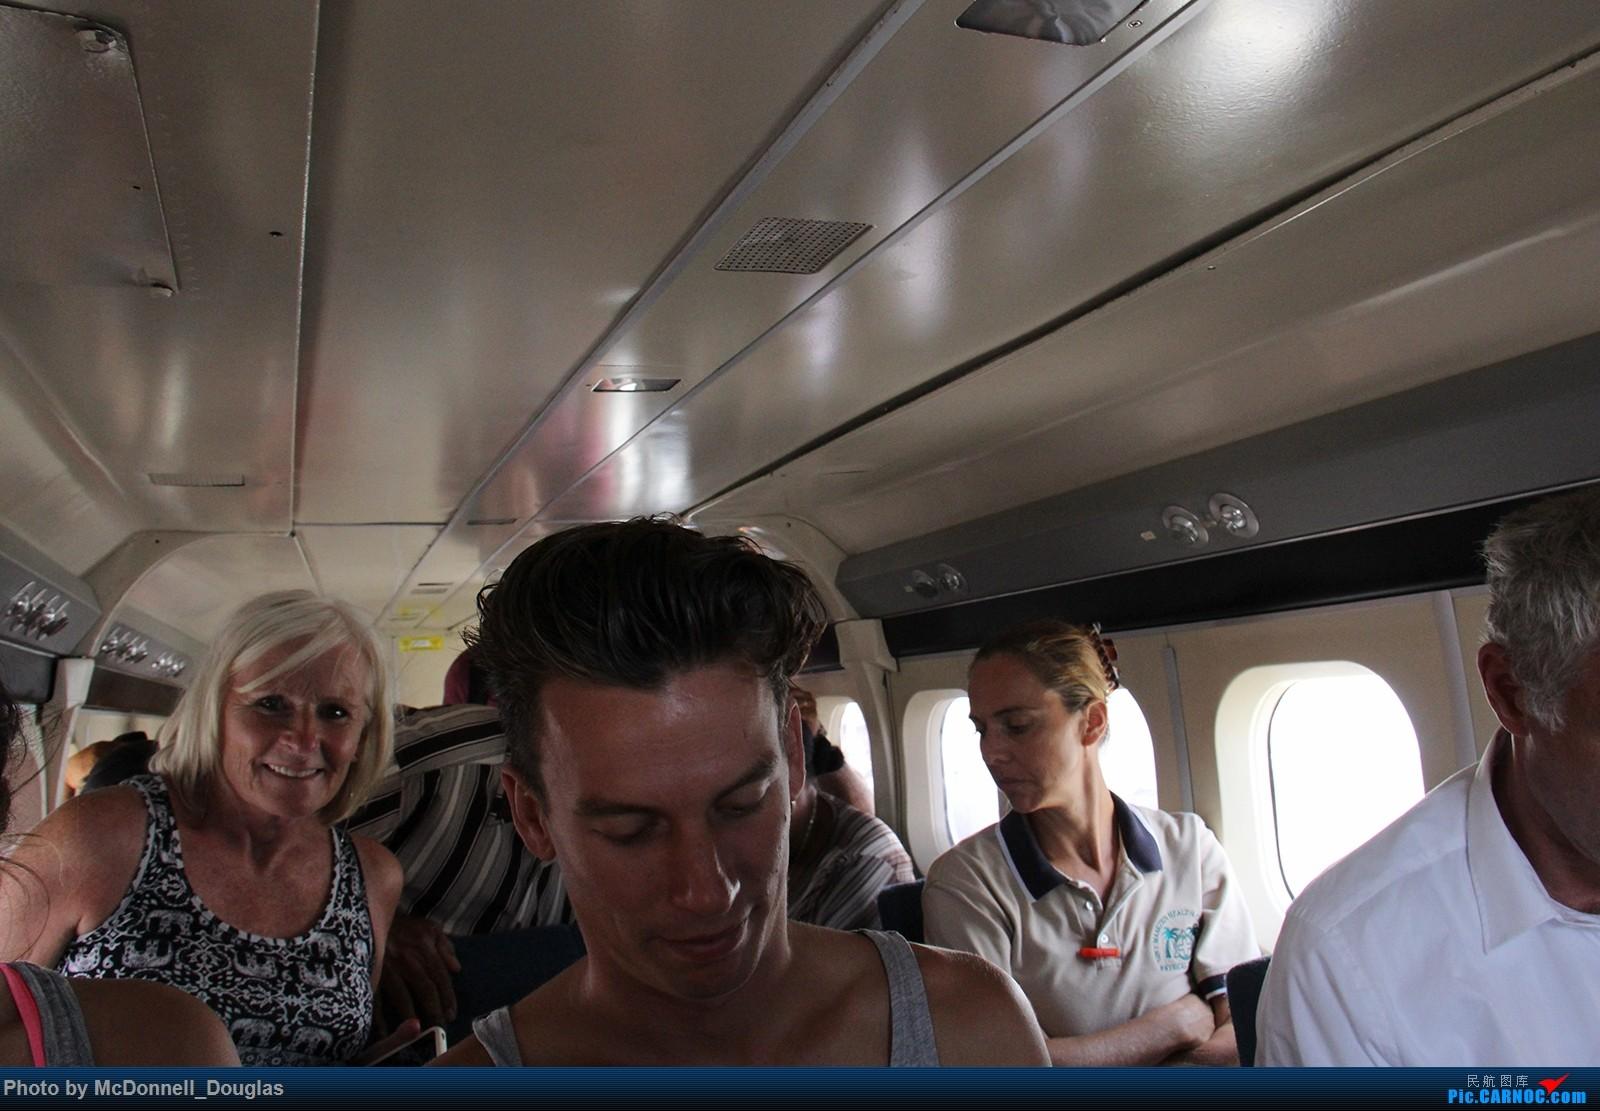 Re:[原创]【上海飞友会】图会很多,也有很多驾驶舱,杂七杂八的美帝,梦寐以求的圣马丁,这更绝不弃贴【驾驶舱已出现】【已更新至圣马丁部分】 DE HAVILLAND CANADA DHC-6-310 PJ-WII 荷属安的列斯群岛朱利安娜公主机场